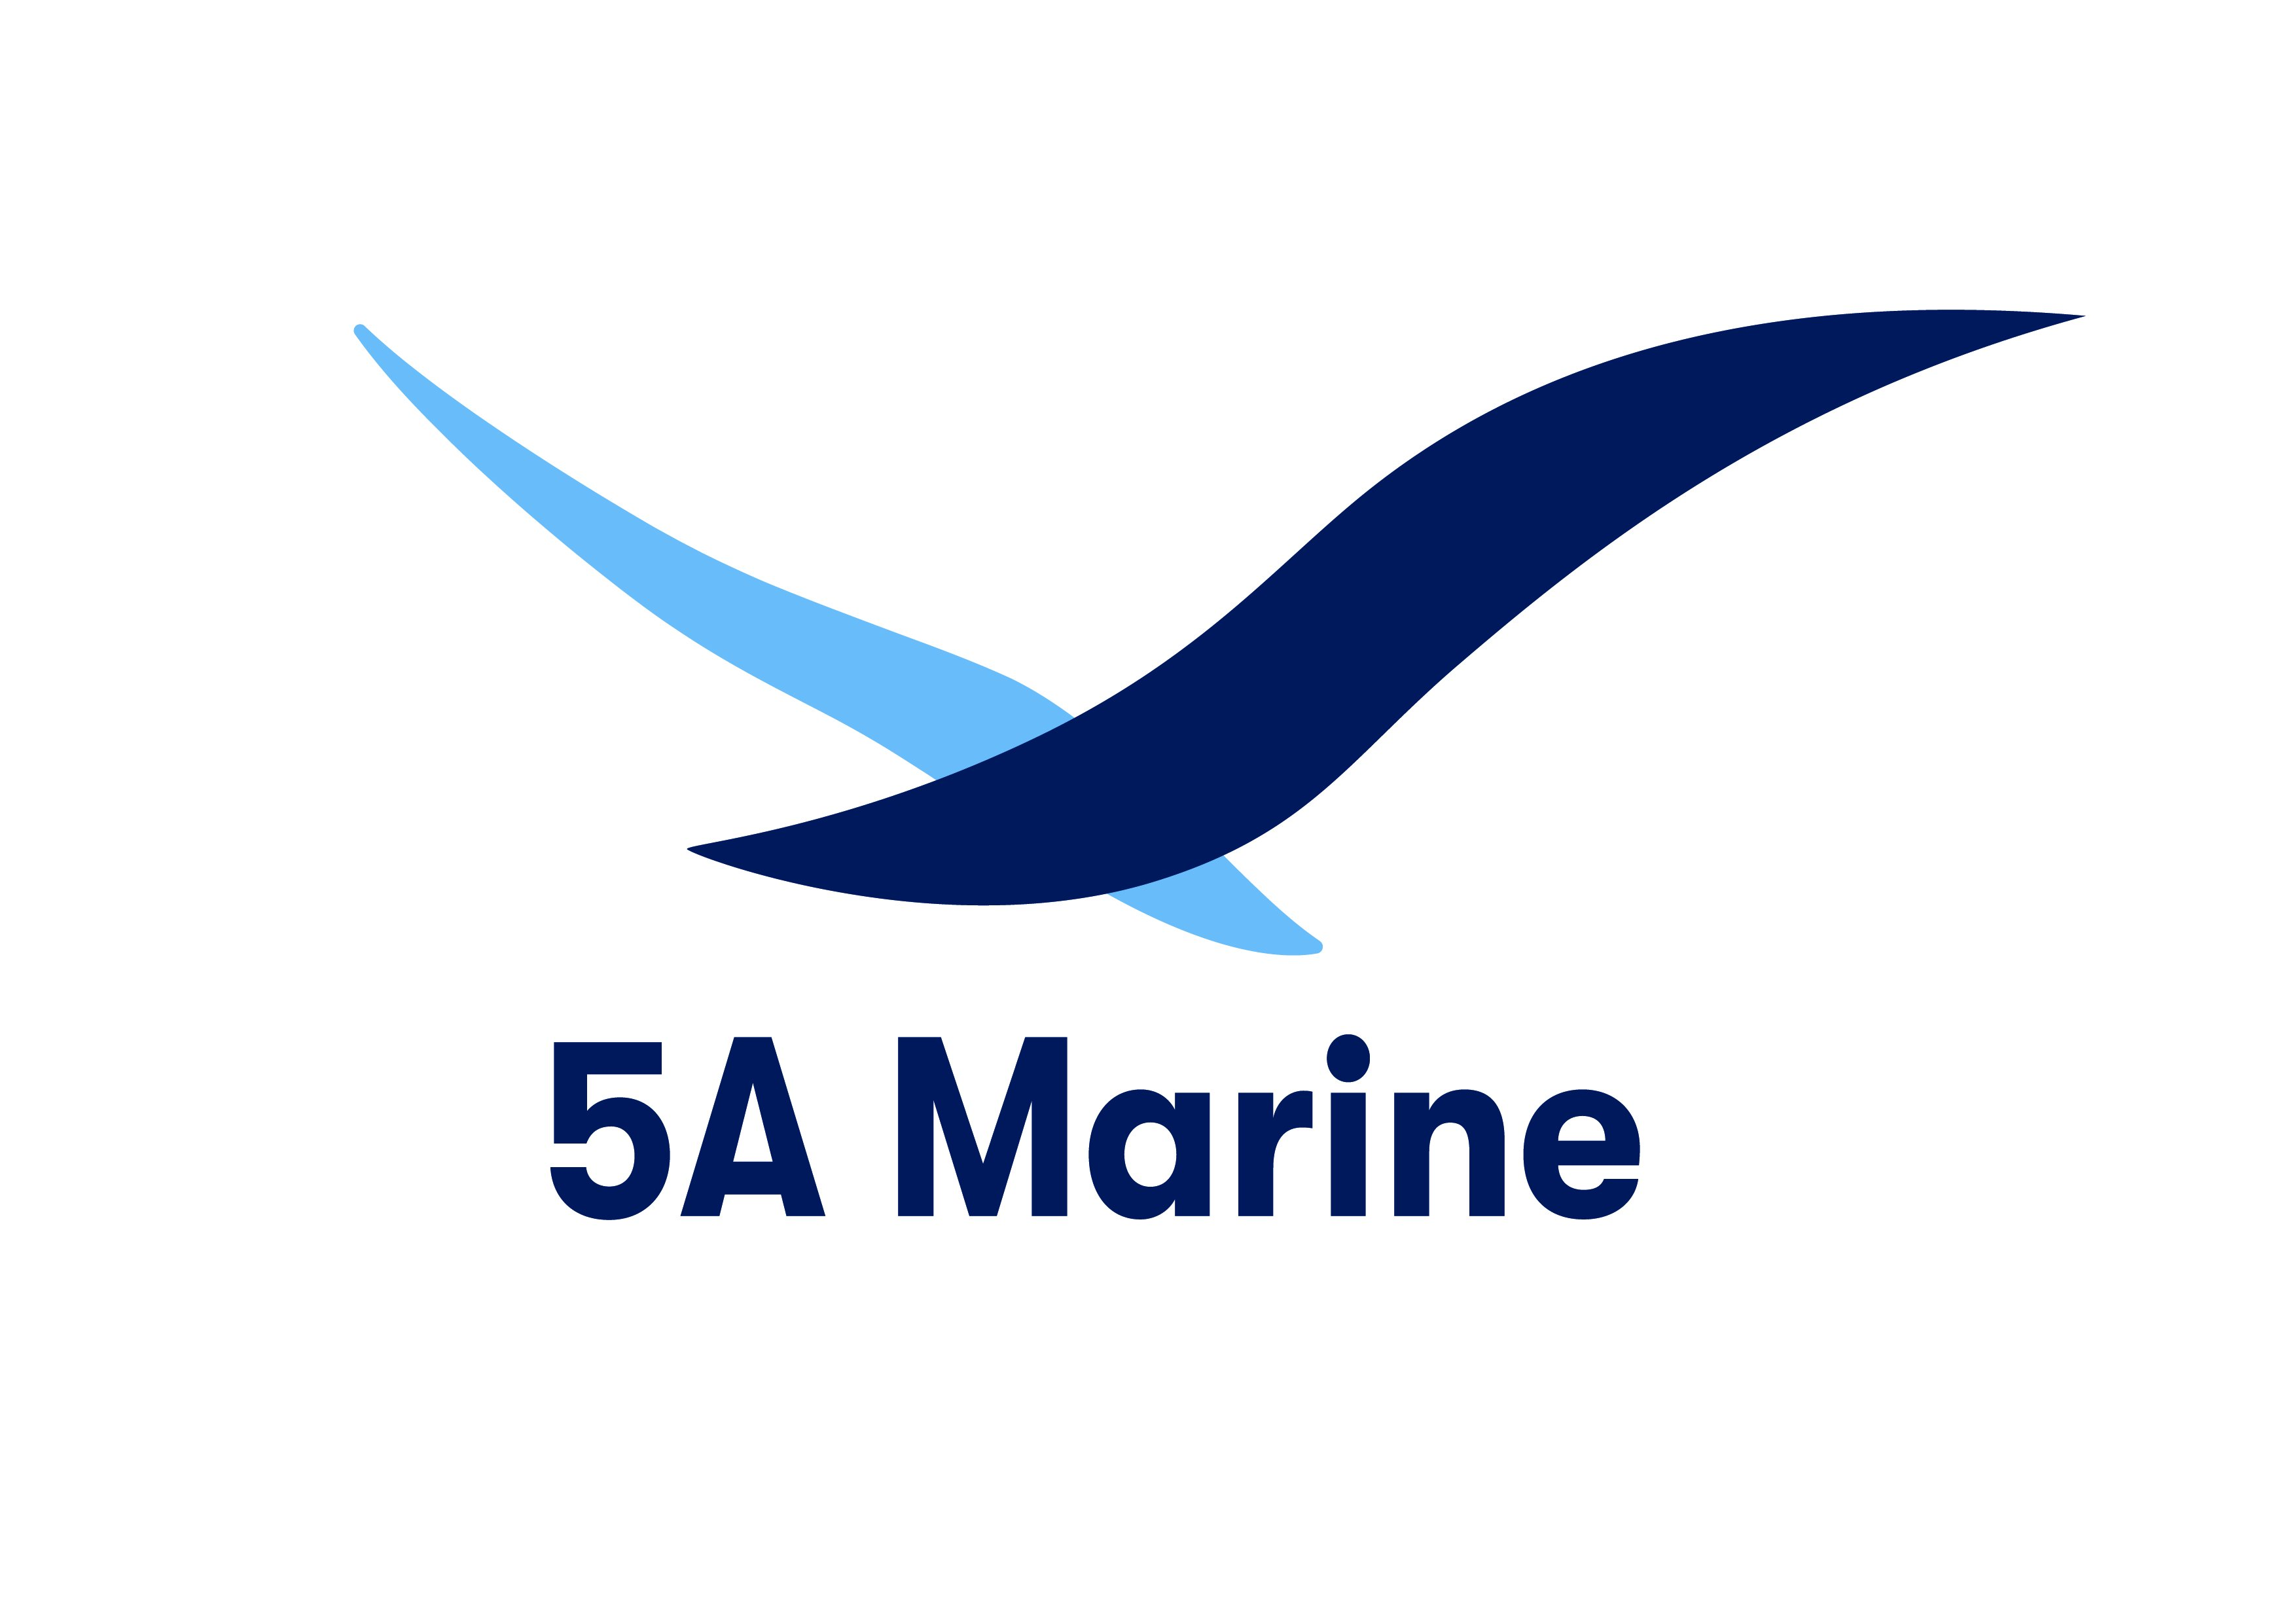 5A Marine